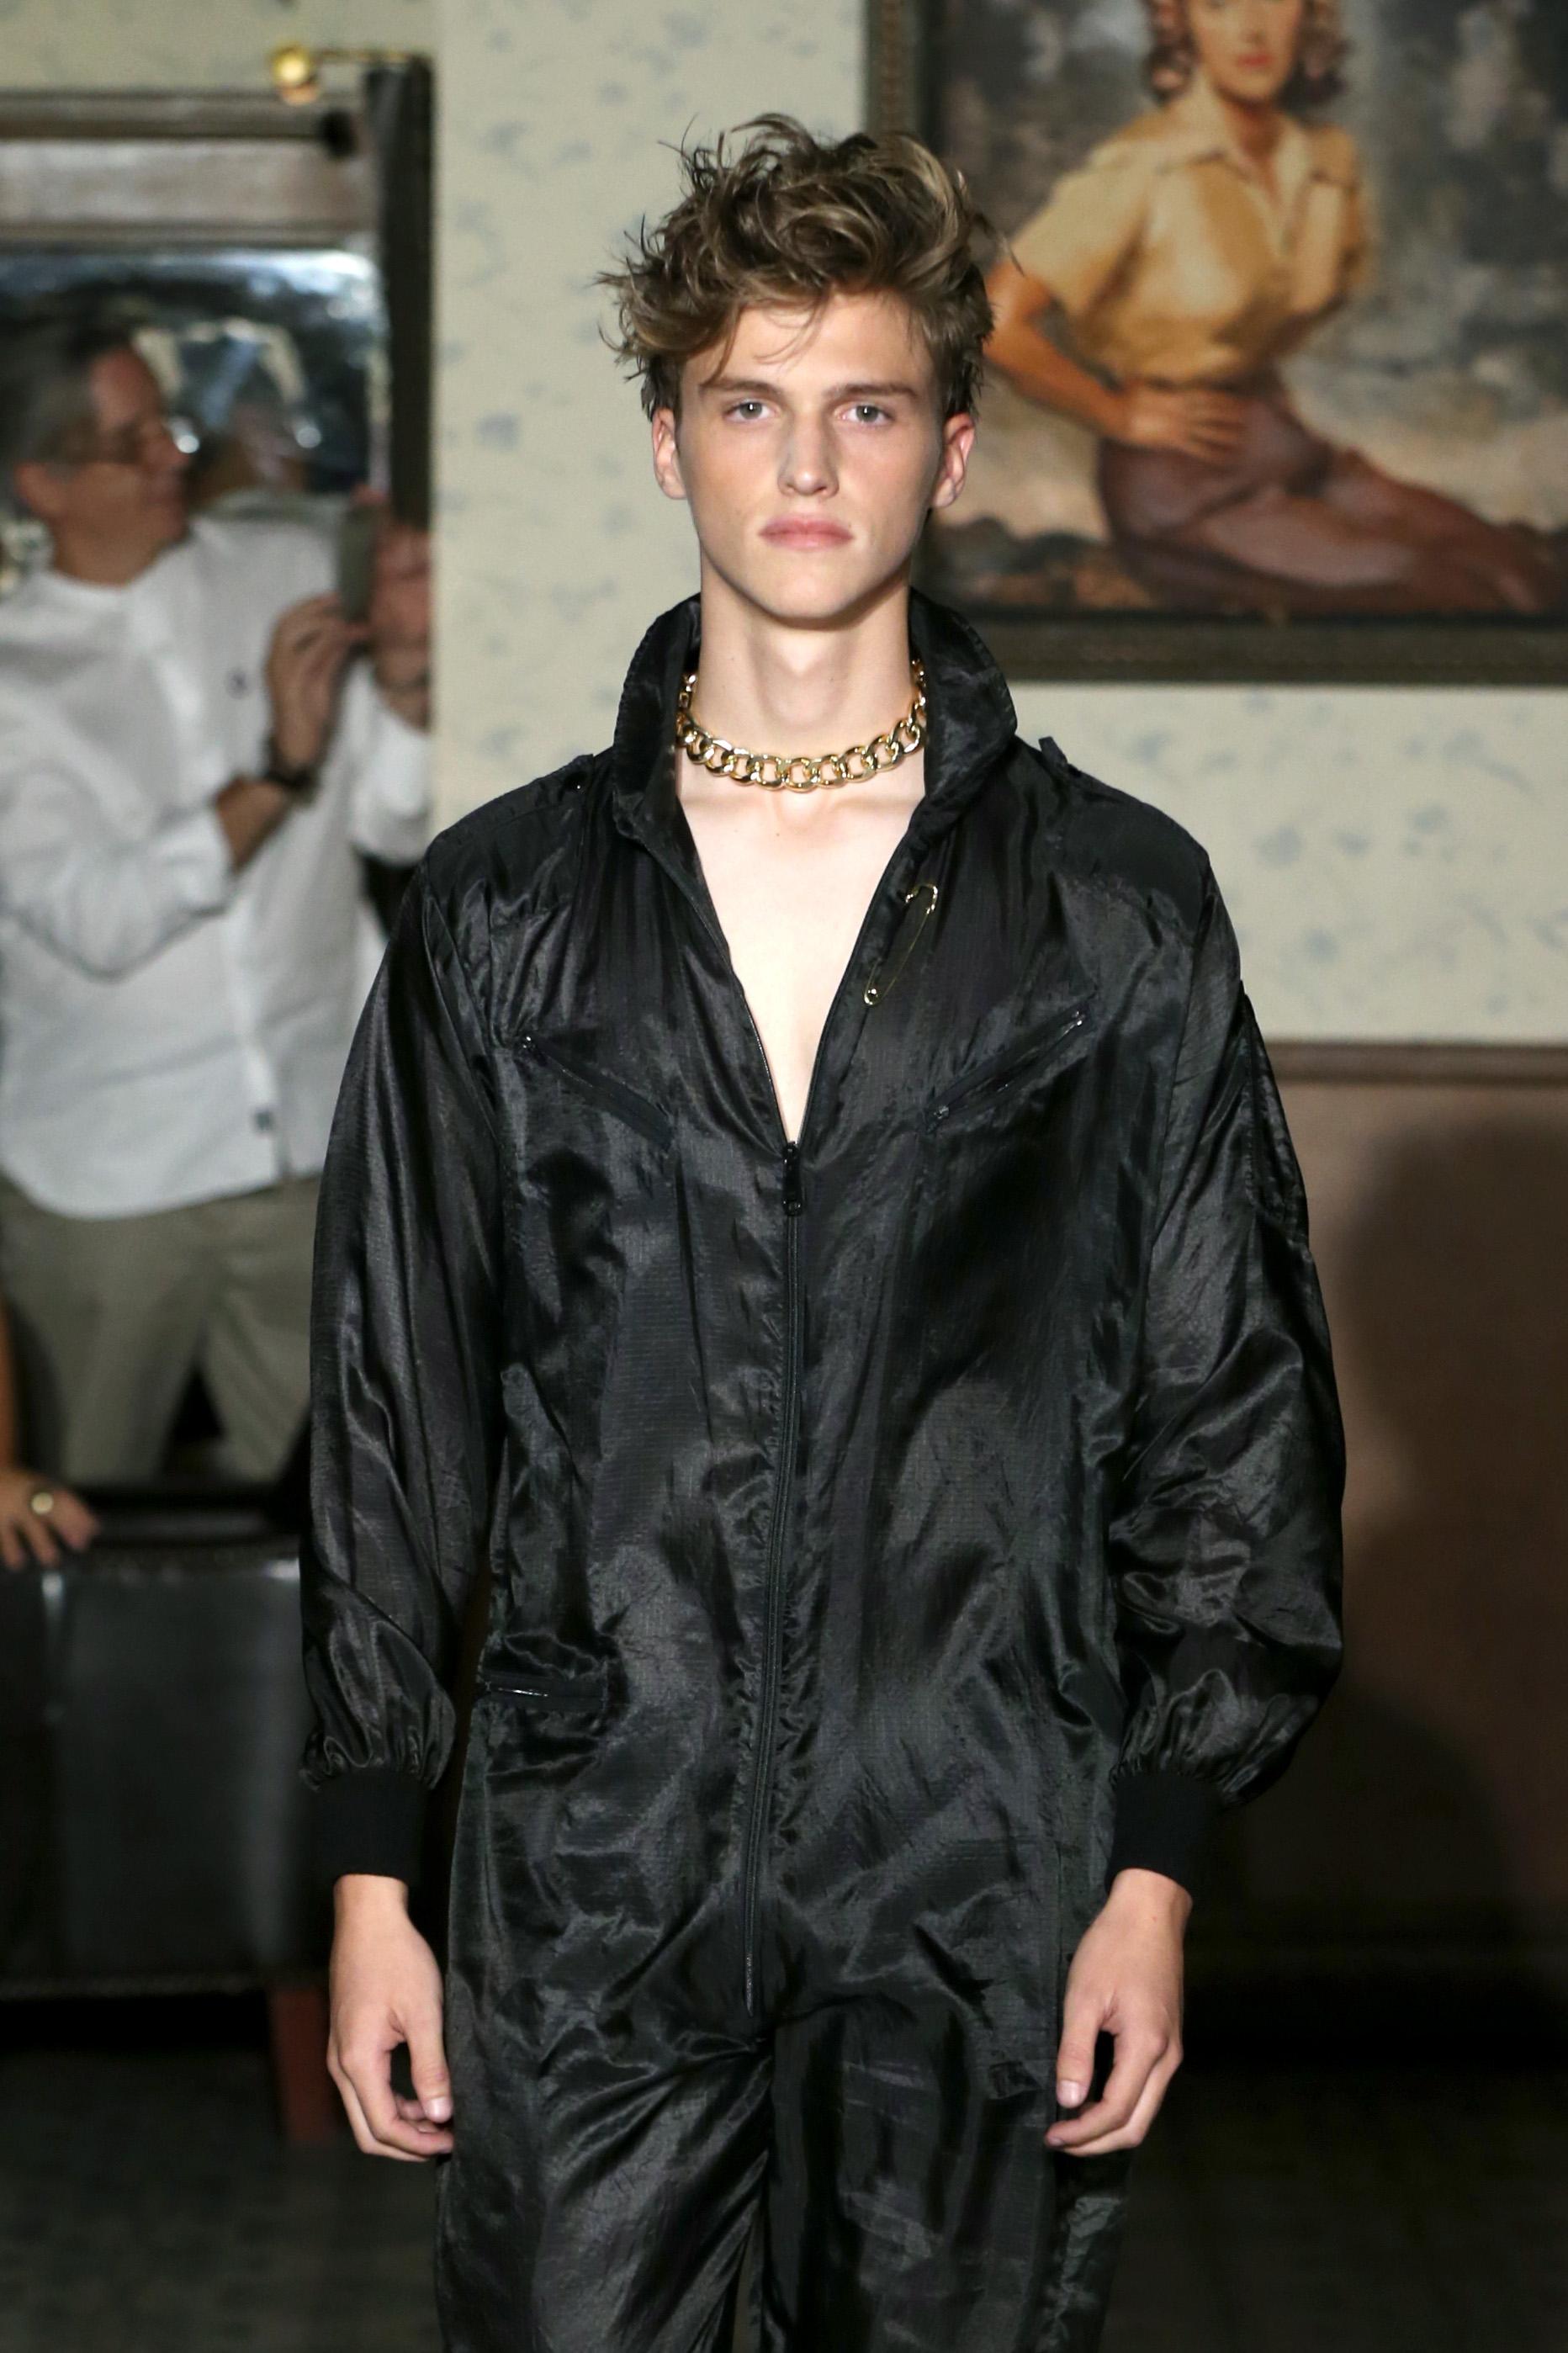 A male model walks the runway.